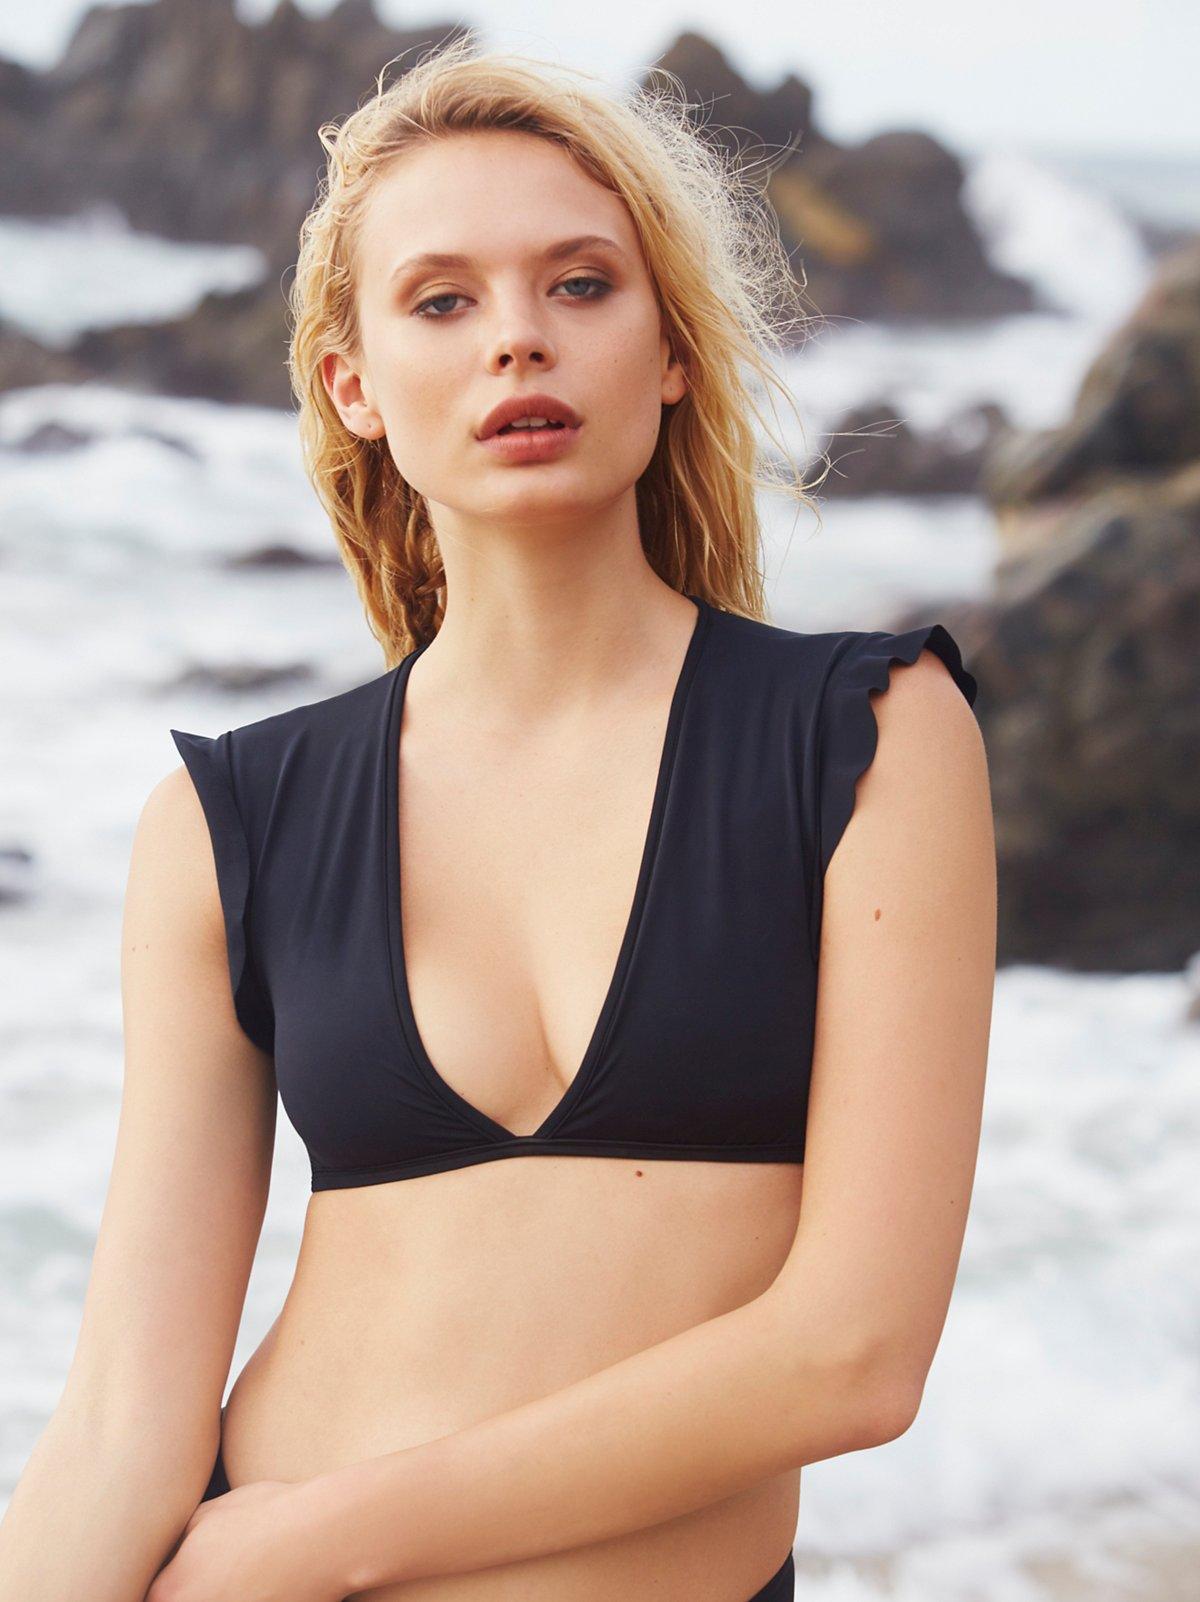 Sophia Swim Top